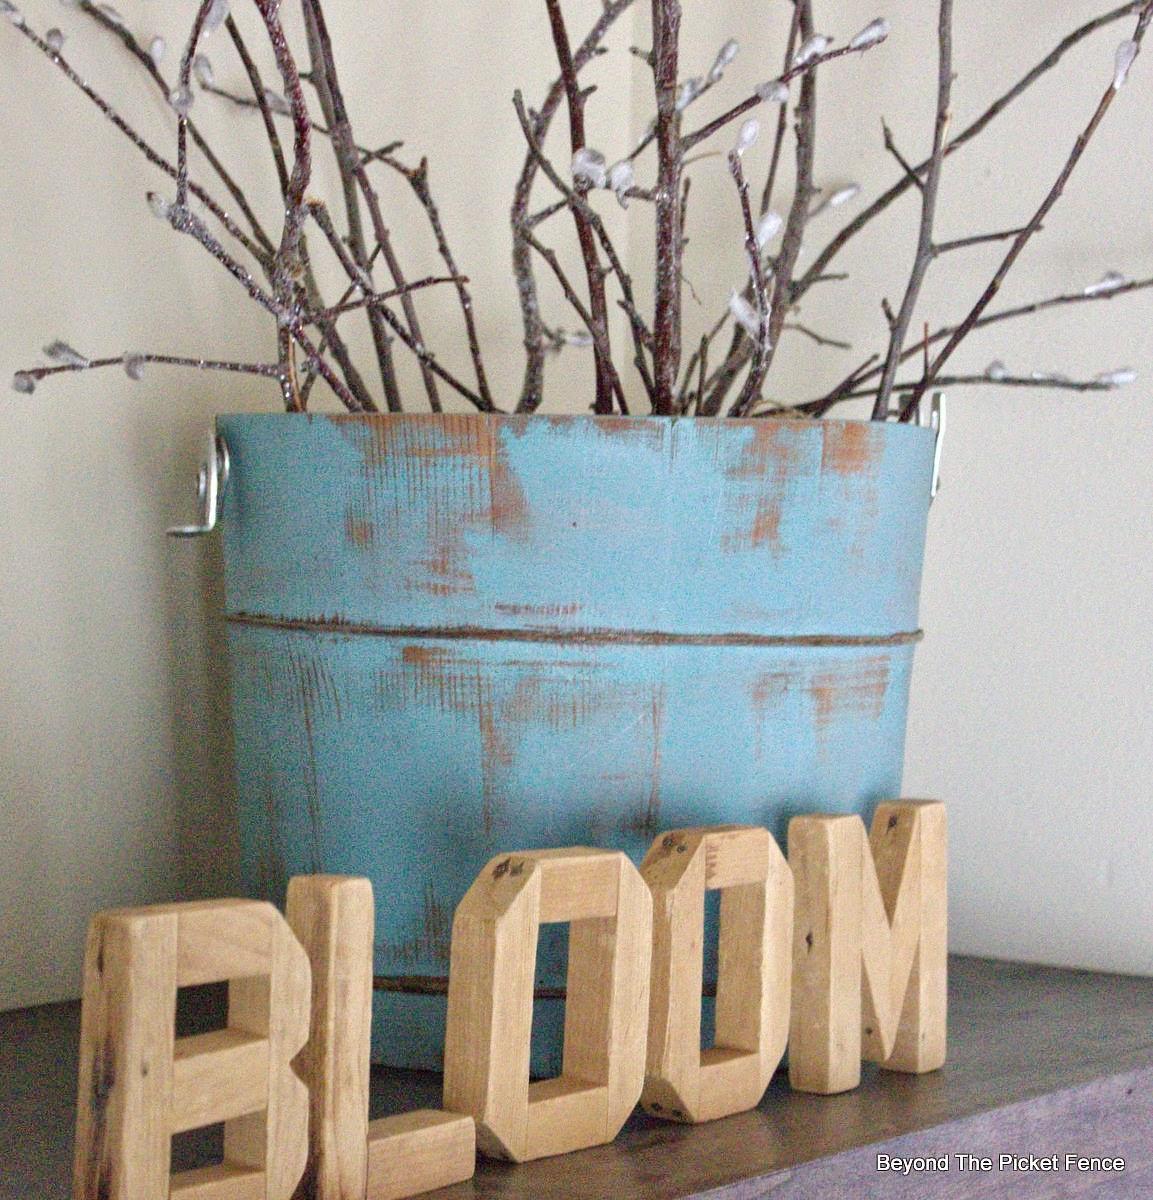 bloom, old bucket, spring, mantel, decor, vintage, shabby, repurposed, DIY, http://bec4-beyondthepicketfence.blogspot.com/2015/03/bestofdiy-spring-pussy-willows.html